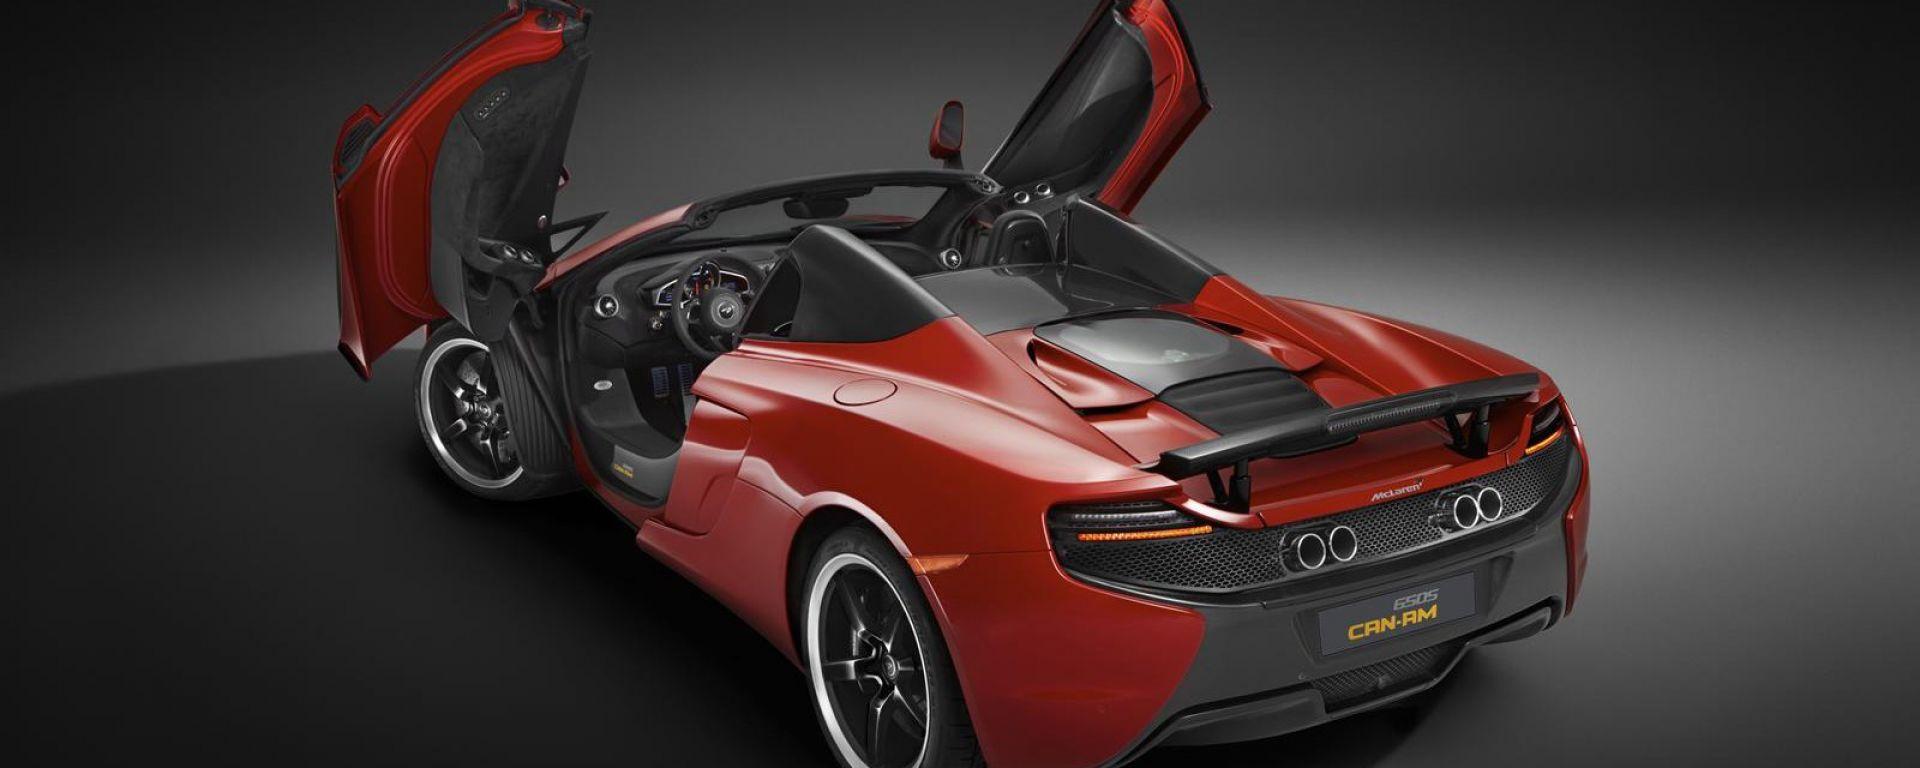 novità auto: mclaren 650s spider can-am - motorbox